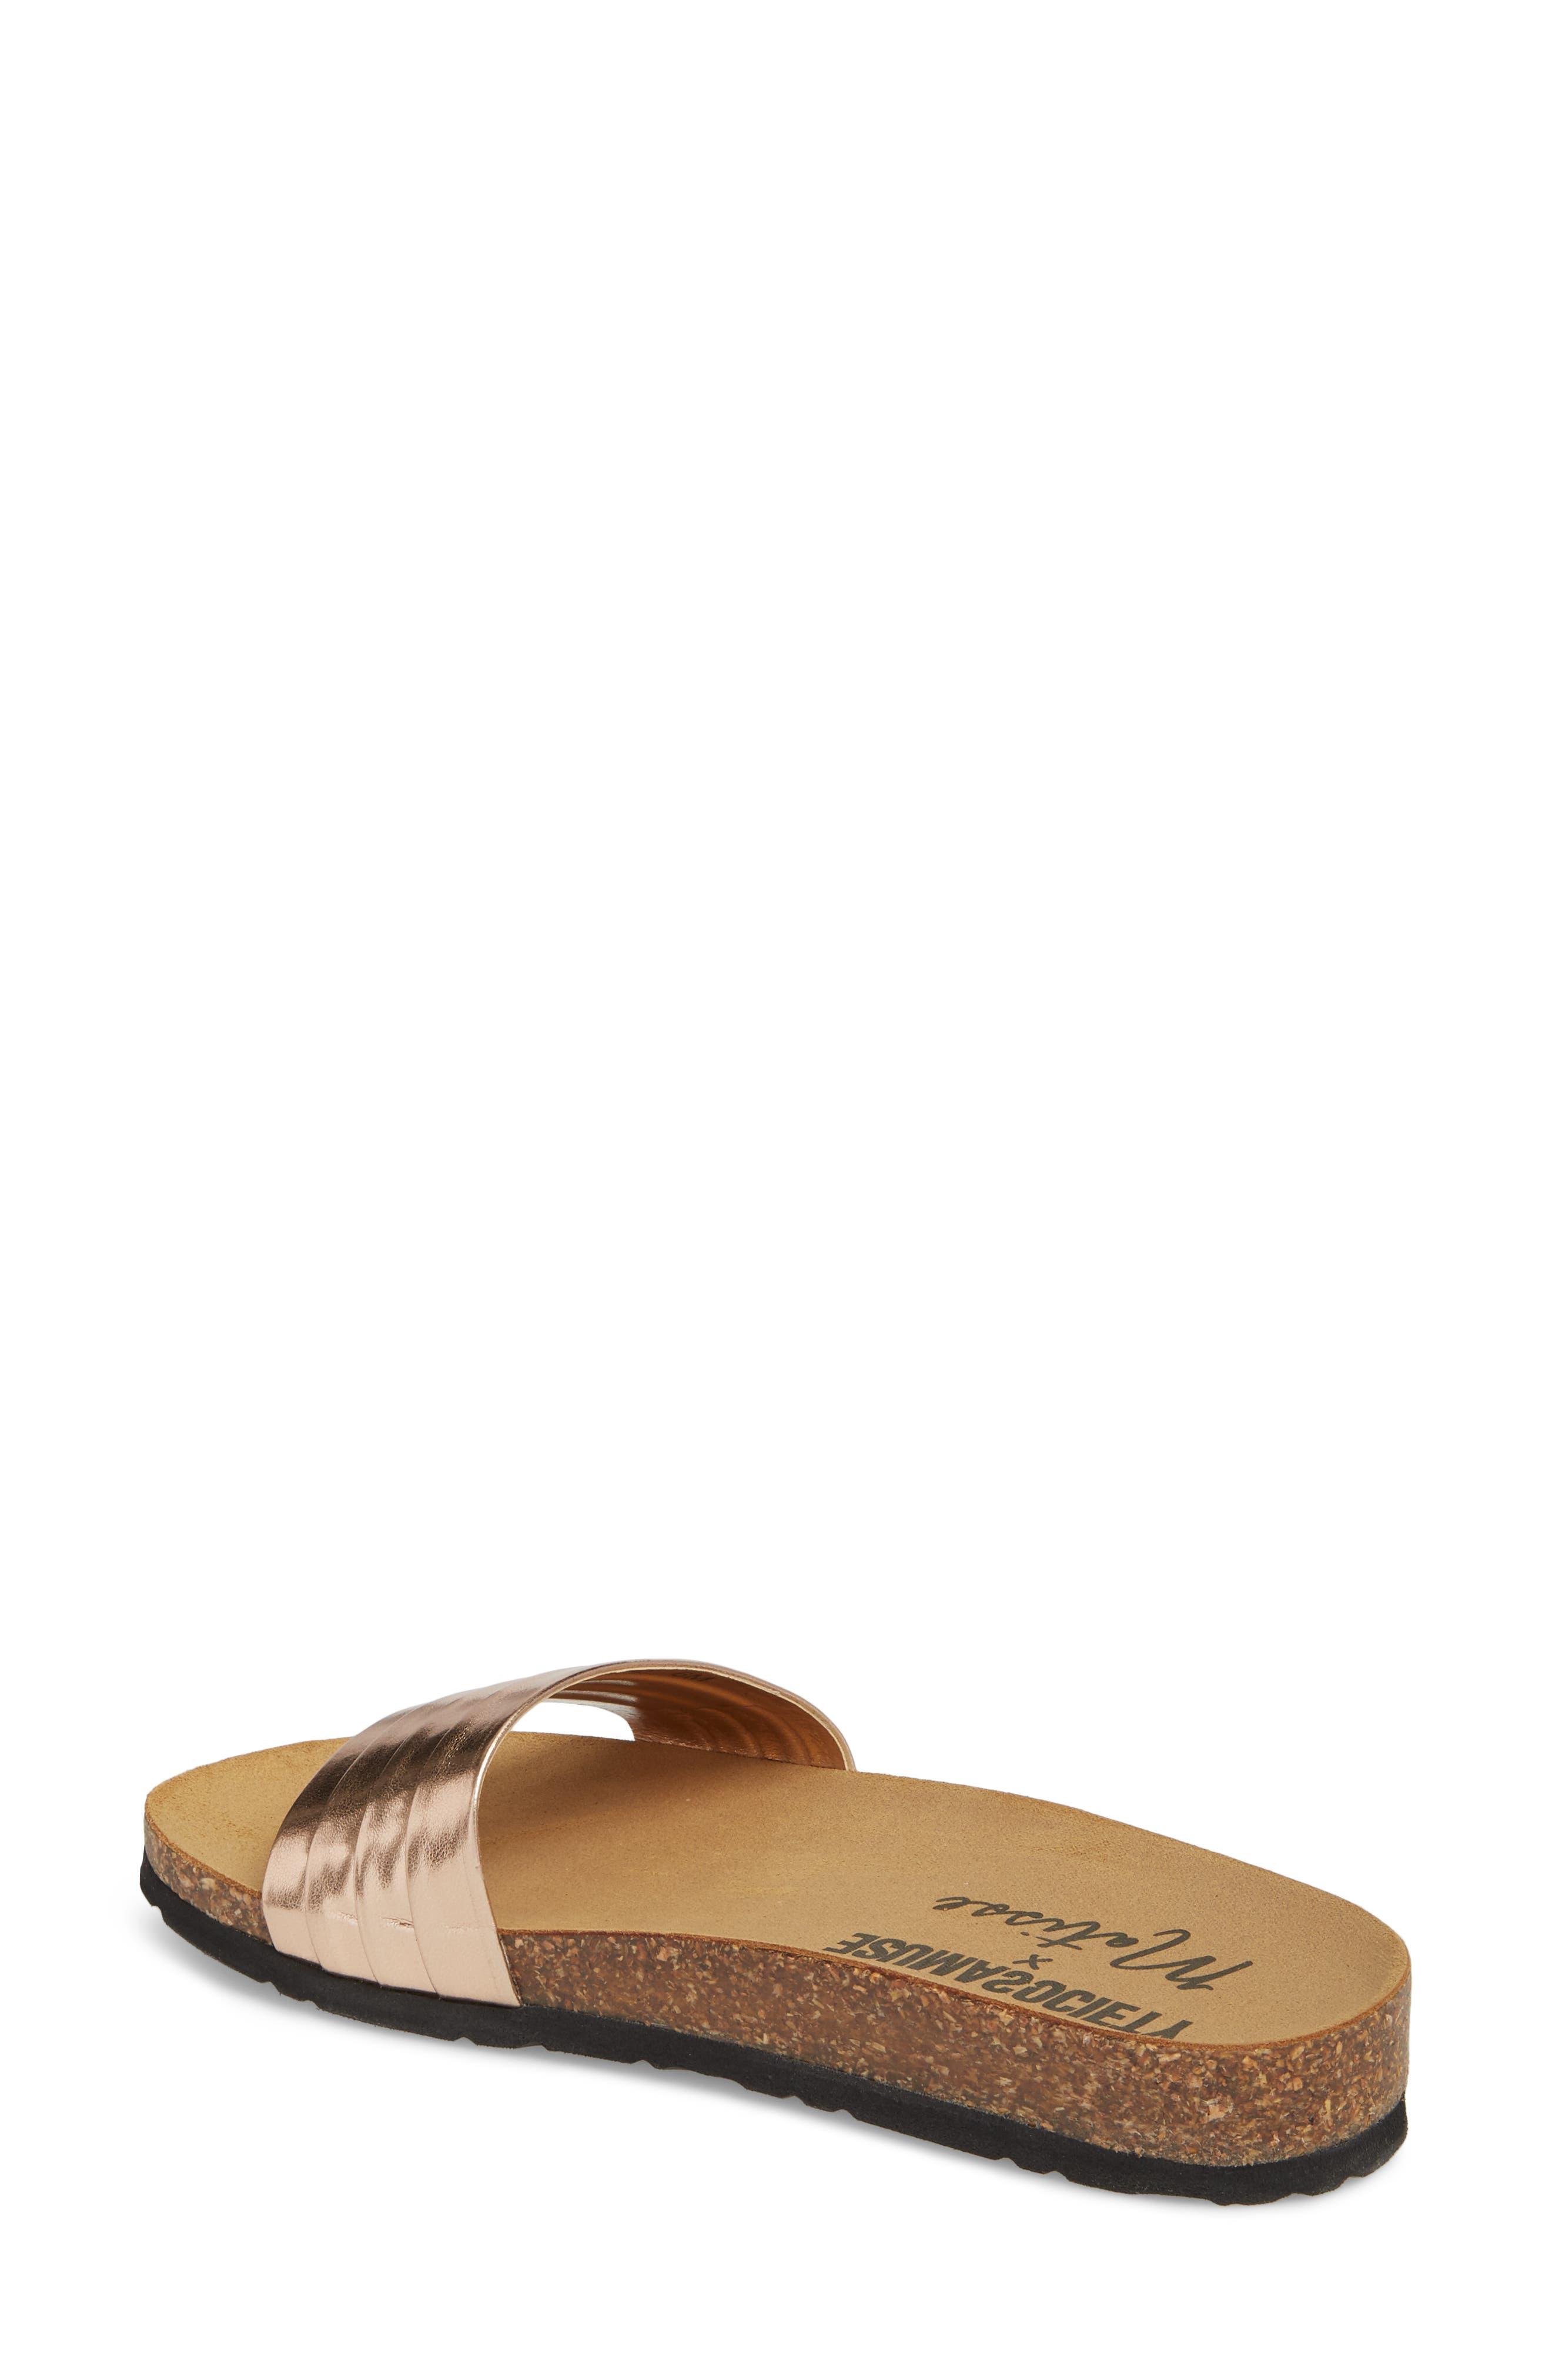 Santos Slide Sandal,                             Alternate thumbnail 2, color,                             Rose Gold Faux Leather